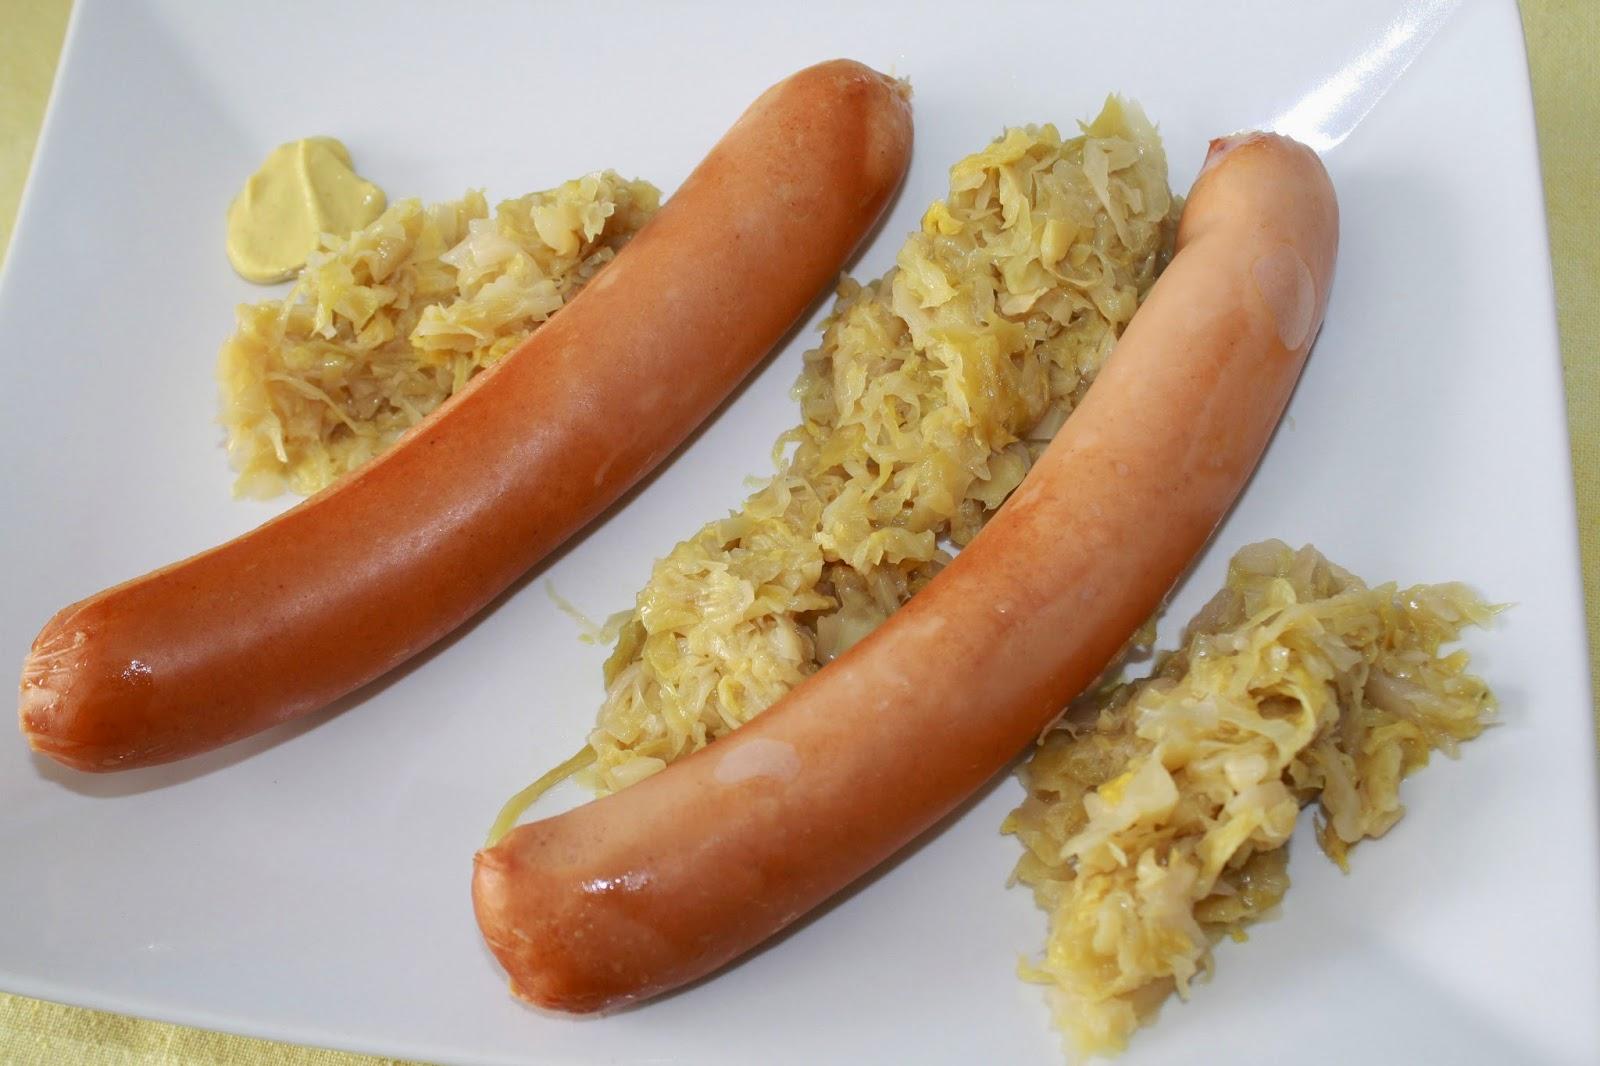 sancrau crauti ricetta ligure